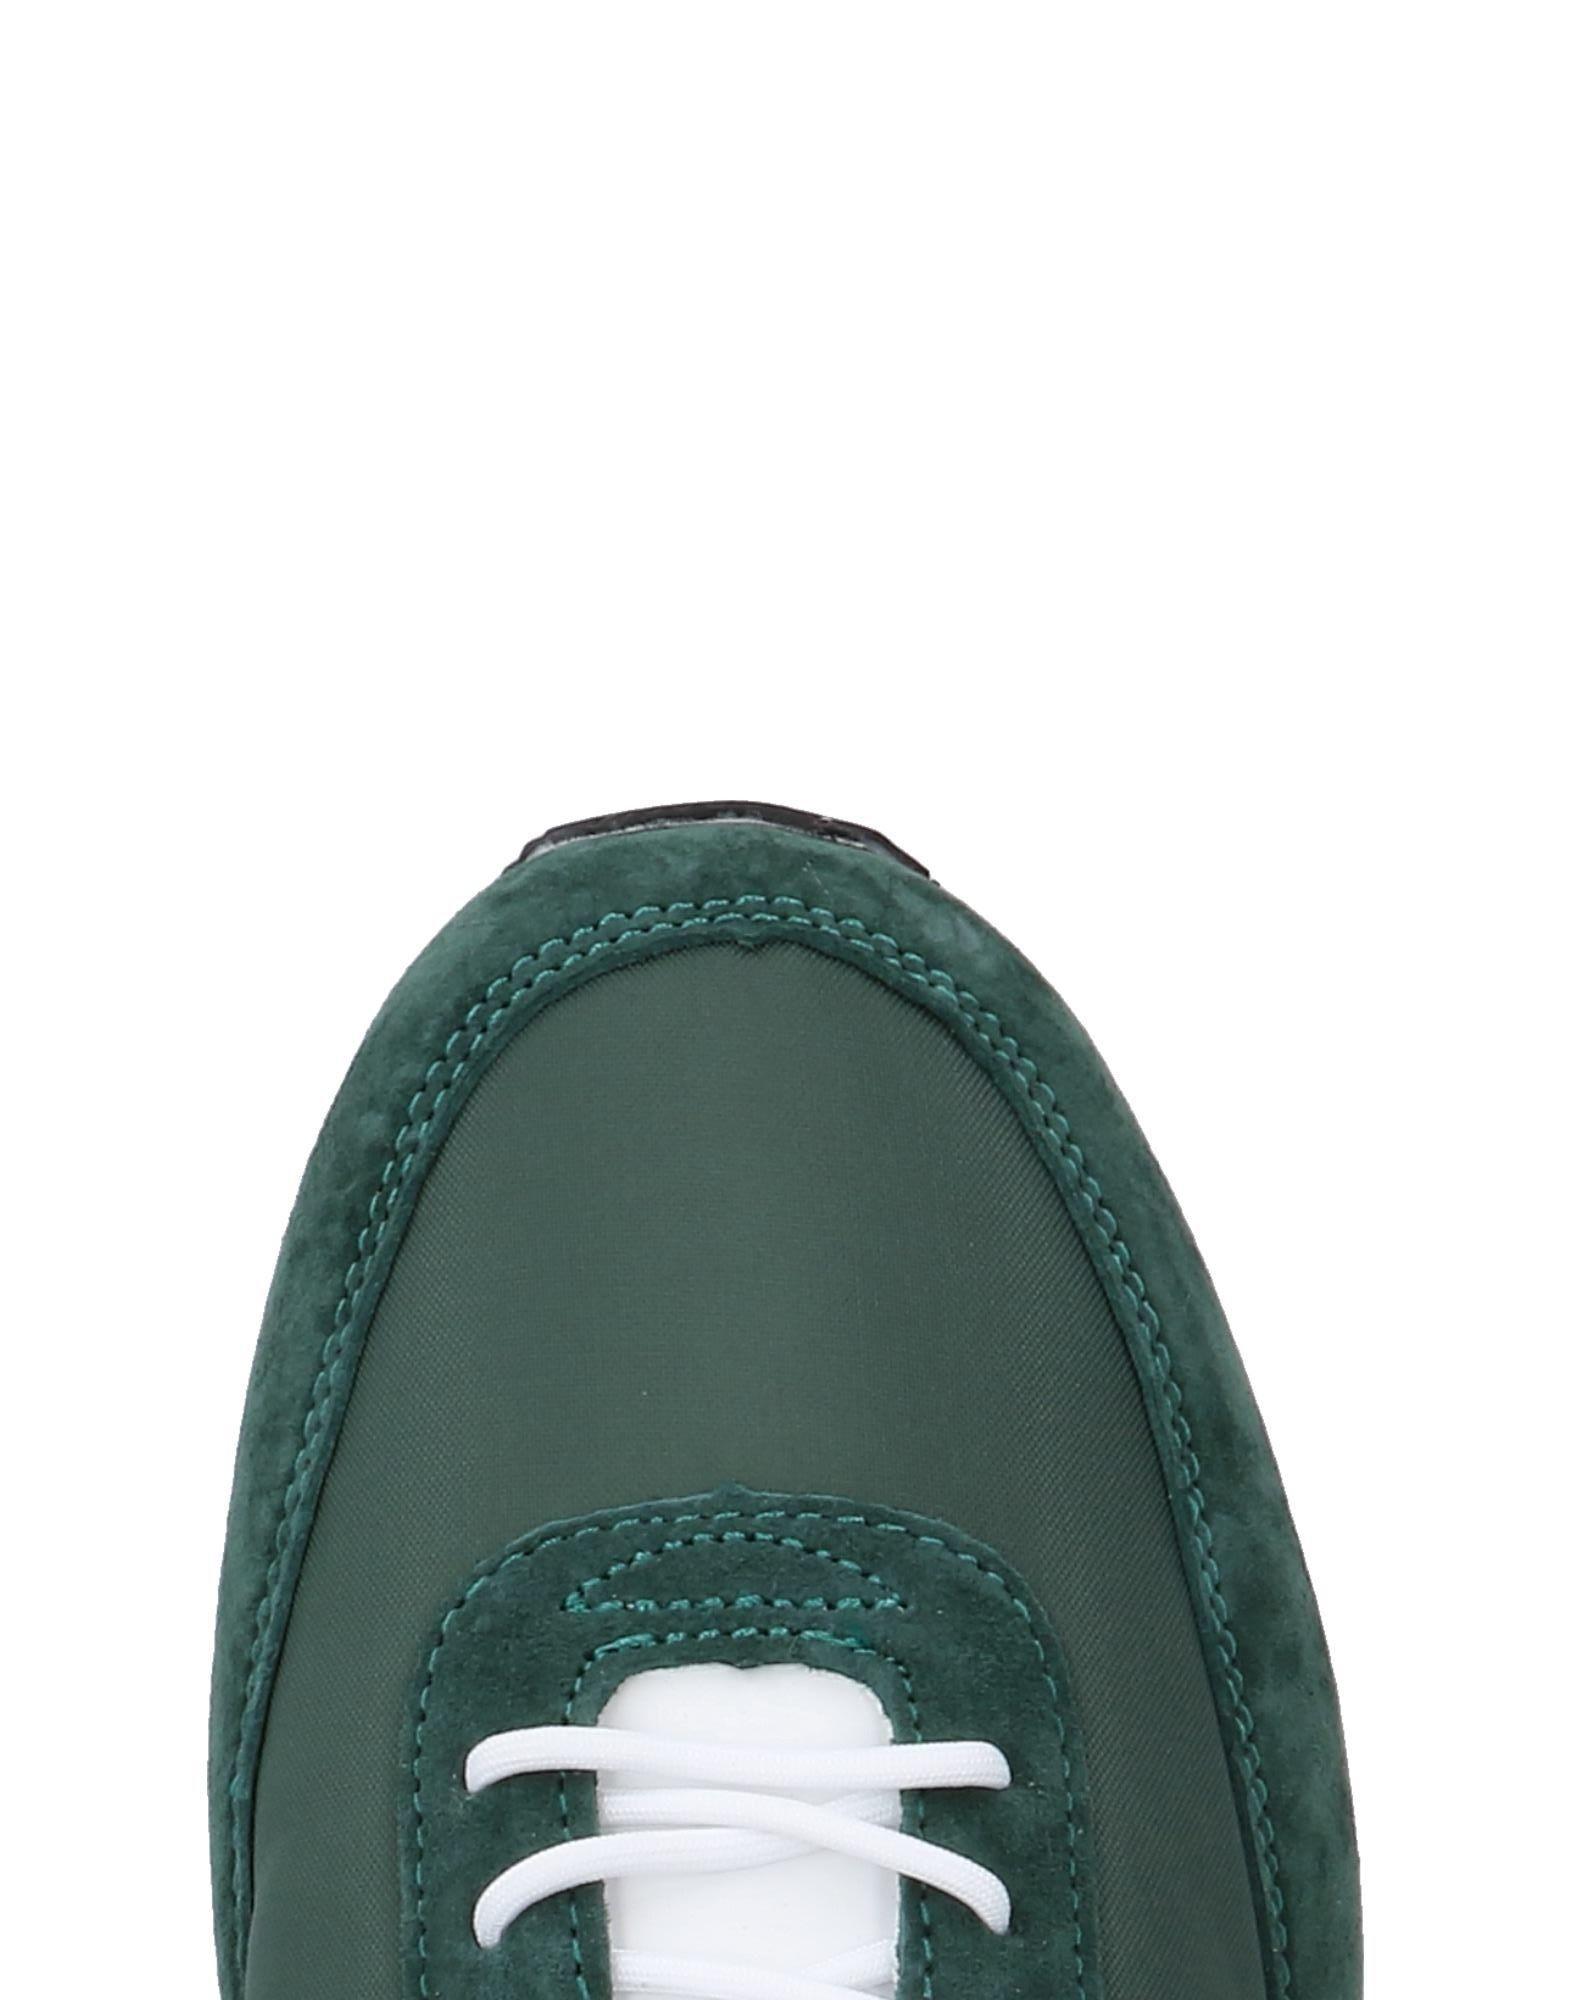 Rabatt echte Schuhe 11498047QI Karhu Sneakers Herren  11498047QI Schuhe 1c9f6d